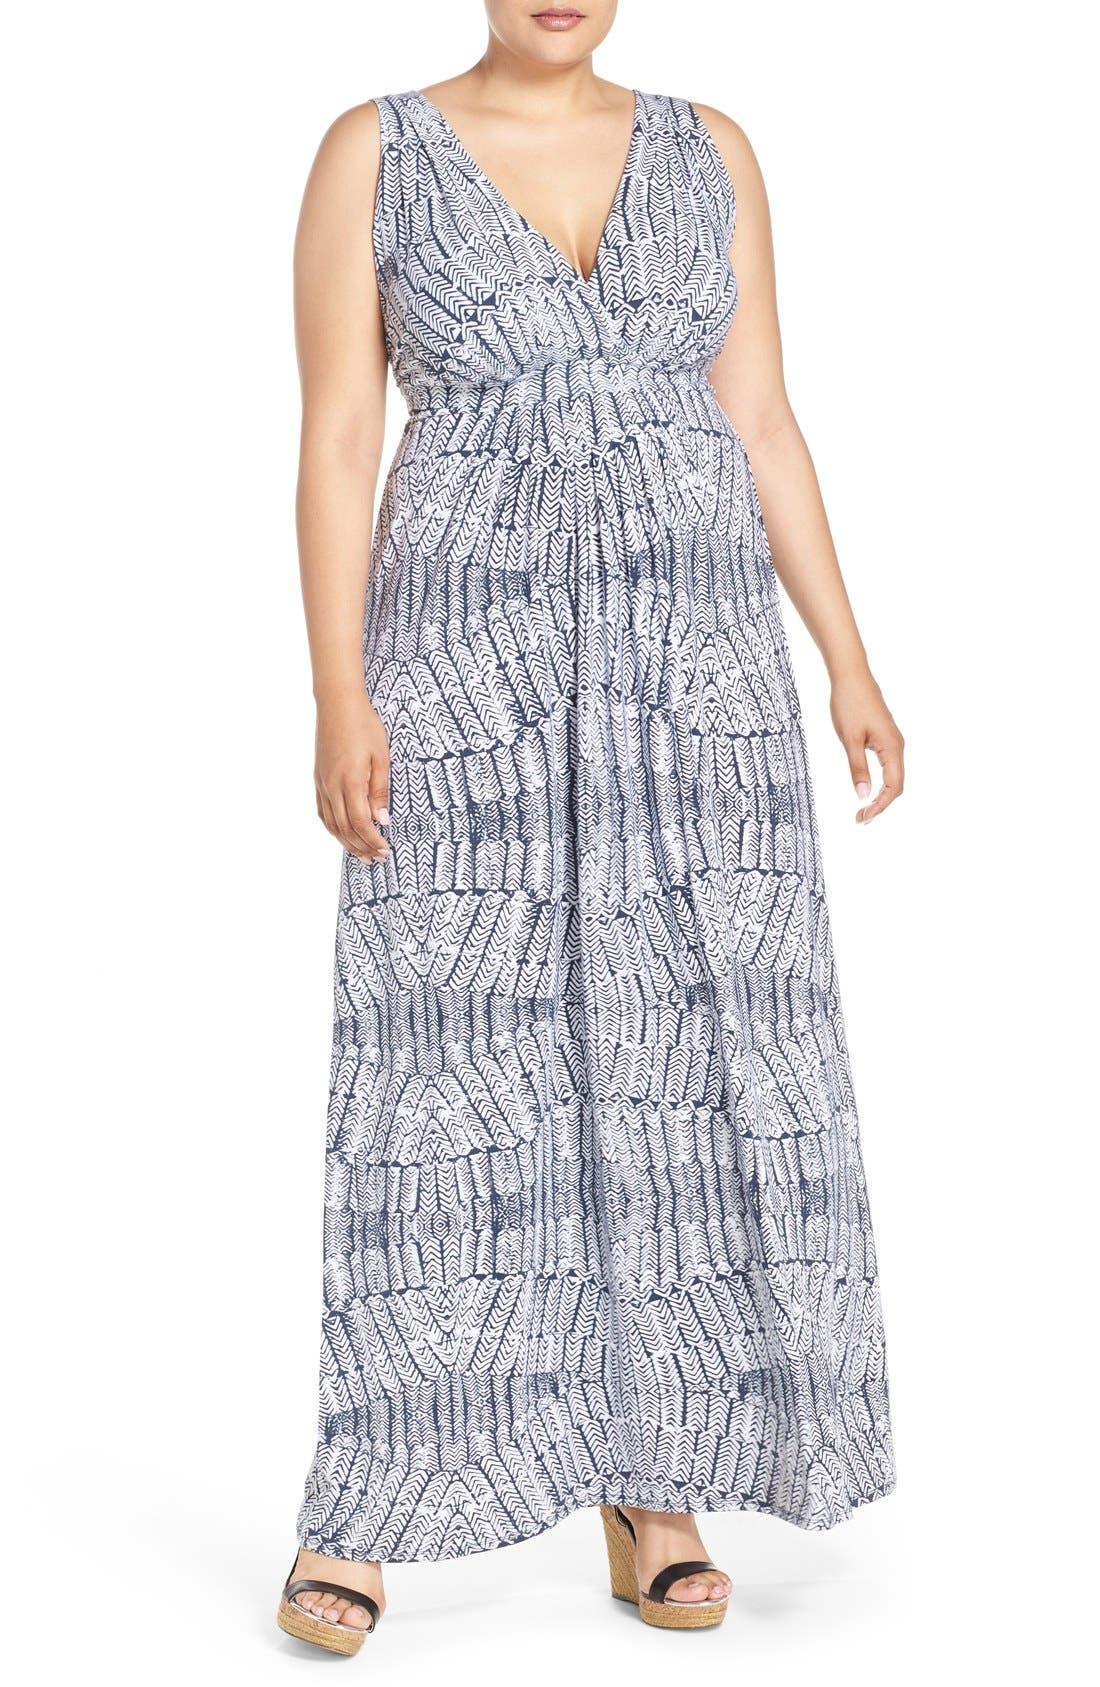 Chloe Empire Waist Maxi Dress,                             Main thumbnail 8, color,